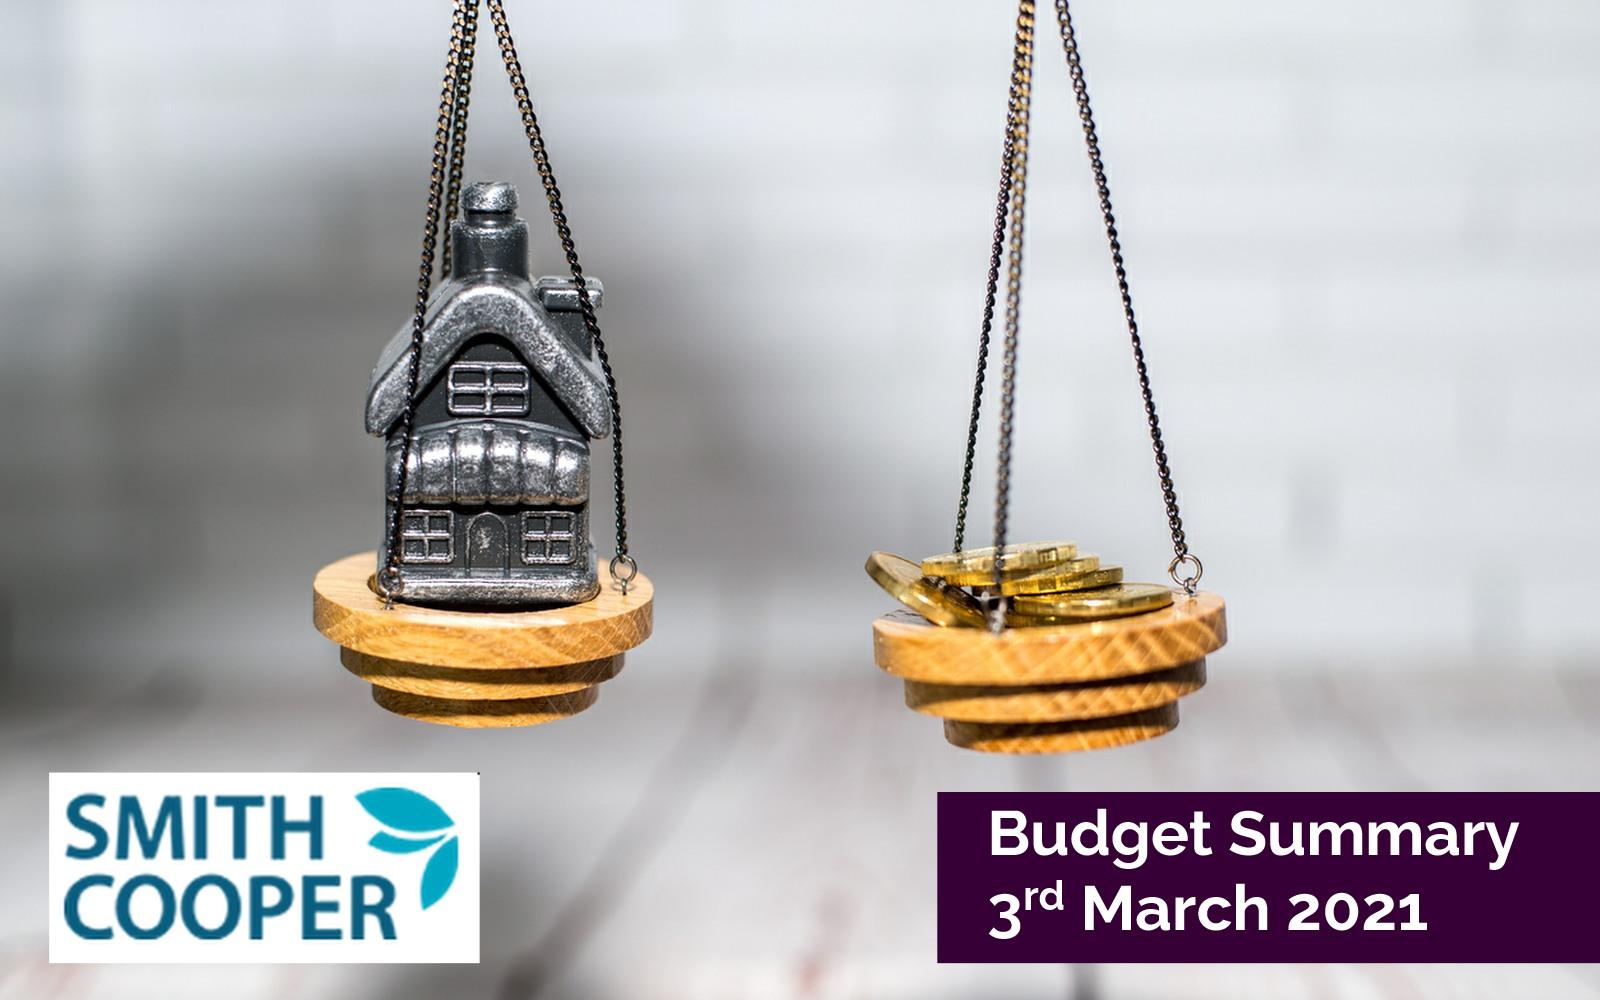 Budget Summary 3rd March 2021